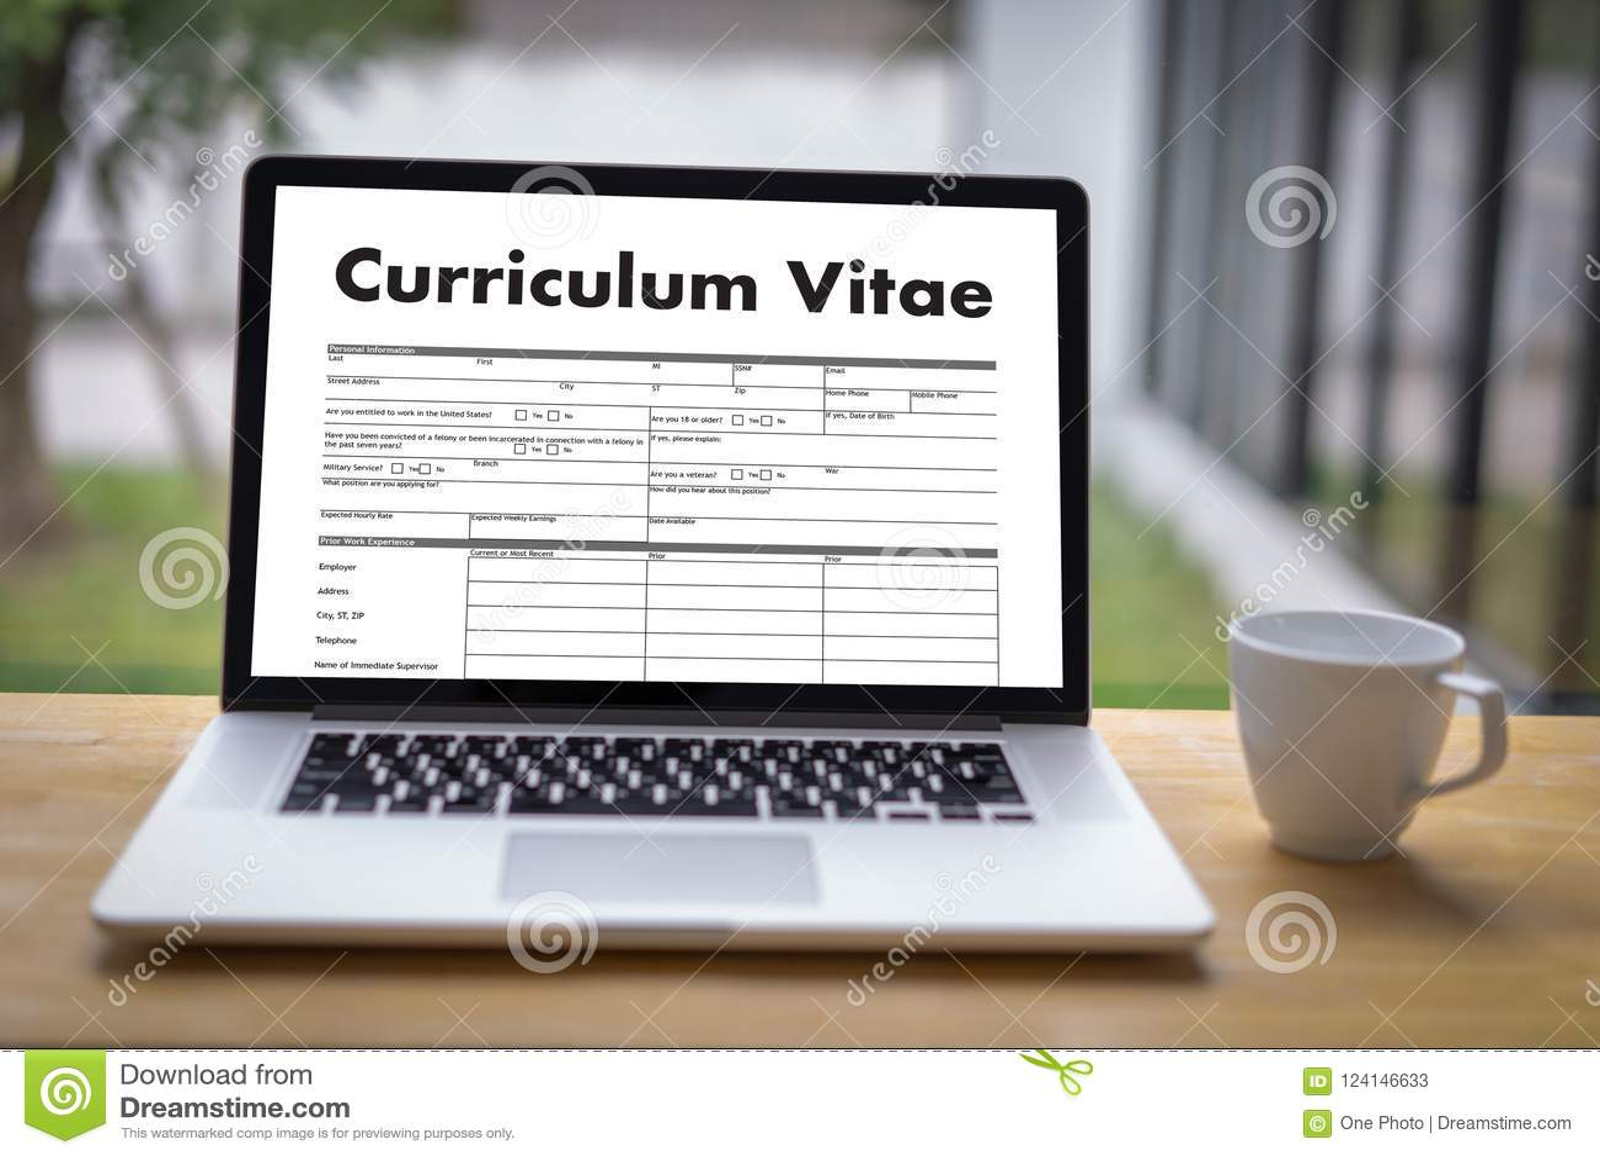 Cv Curriculum Vitae Job Interview Concept With Business Cv Re